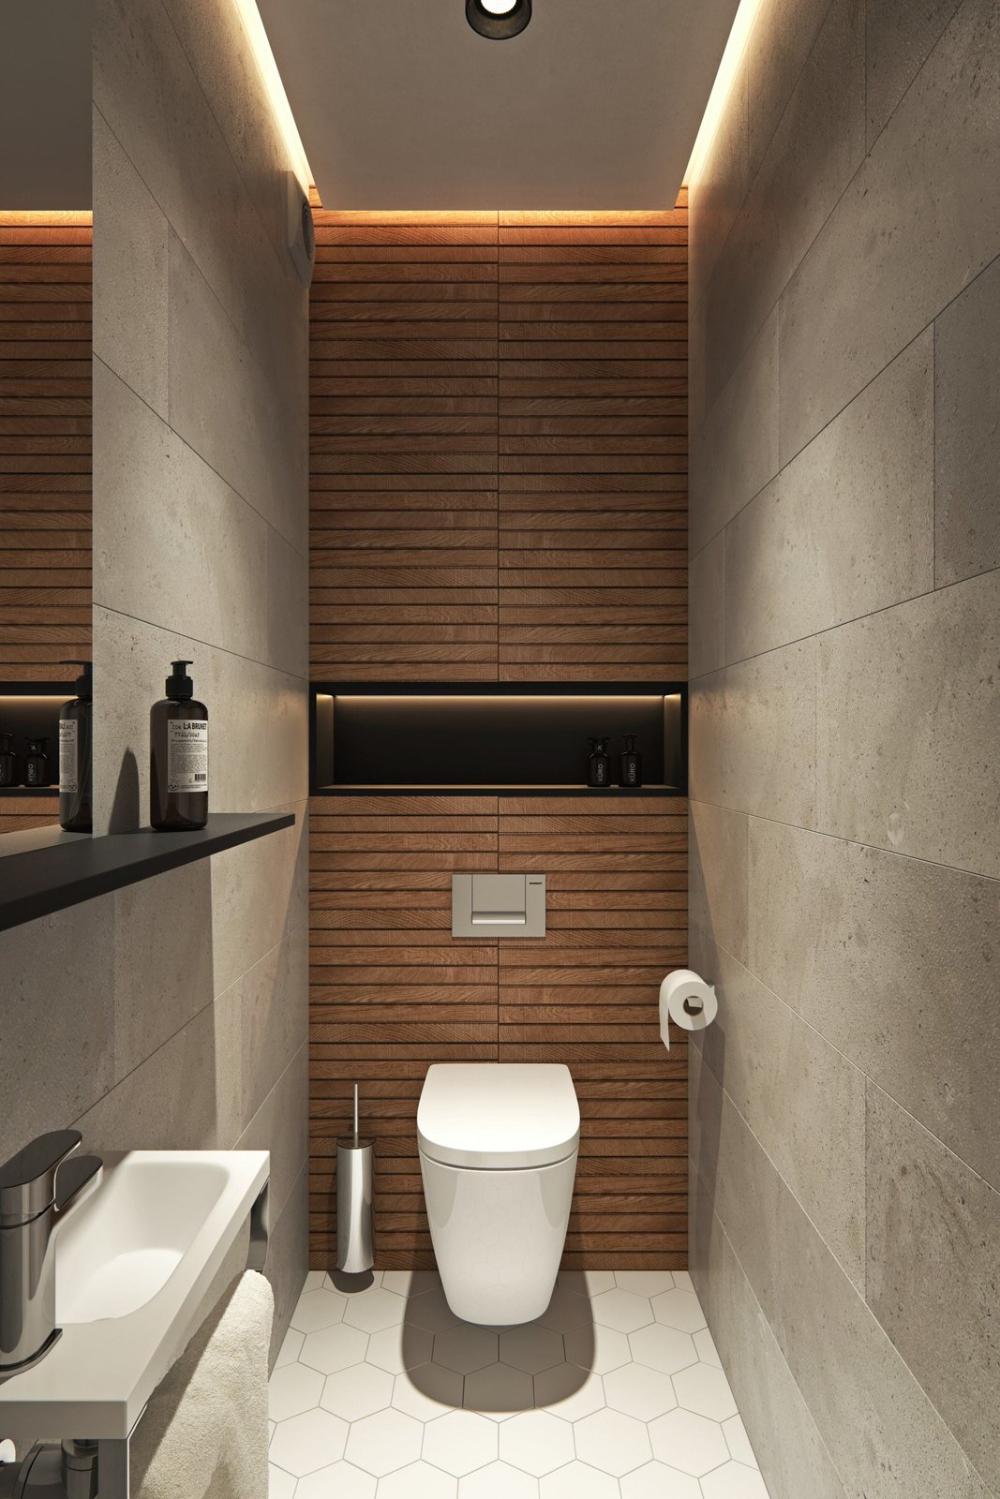 Photo 17 Of 22 In Interior Design Project In Contemporary Style By Top Bathroom Design Bathroom Decor Luxury Bathroom Remodel Designs